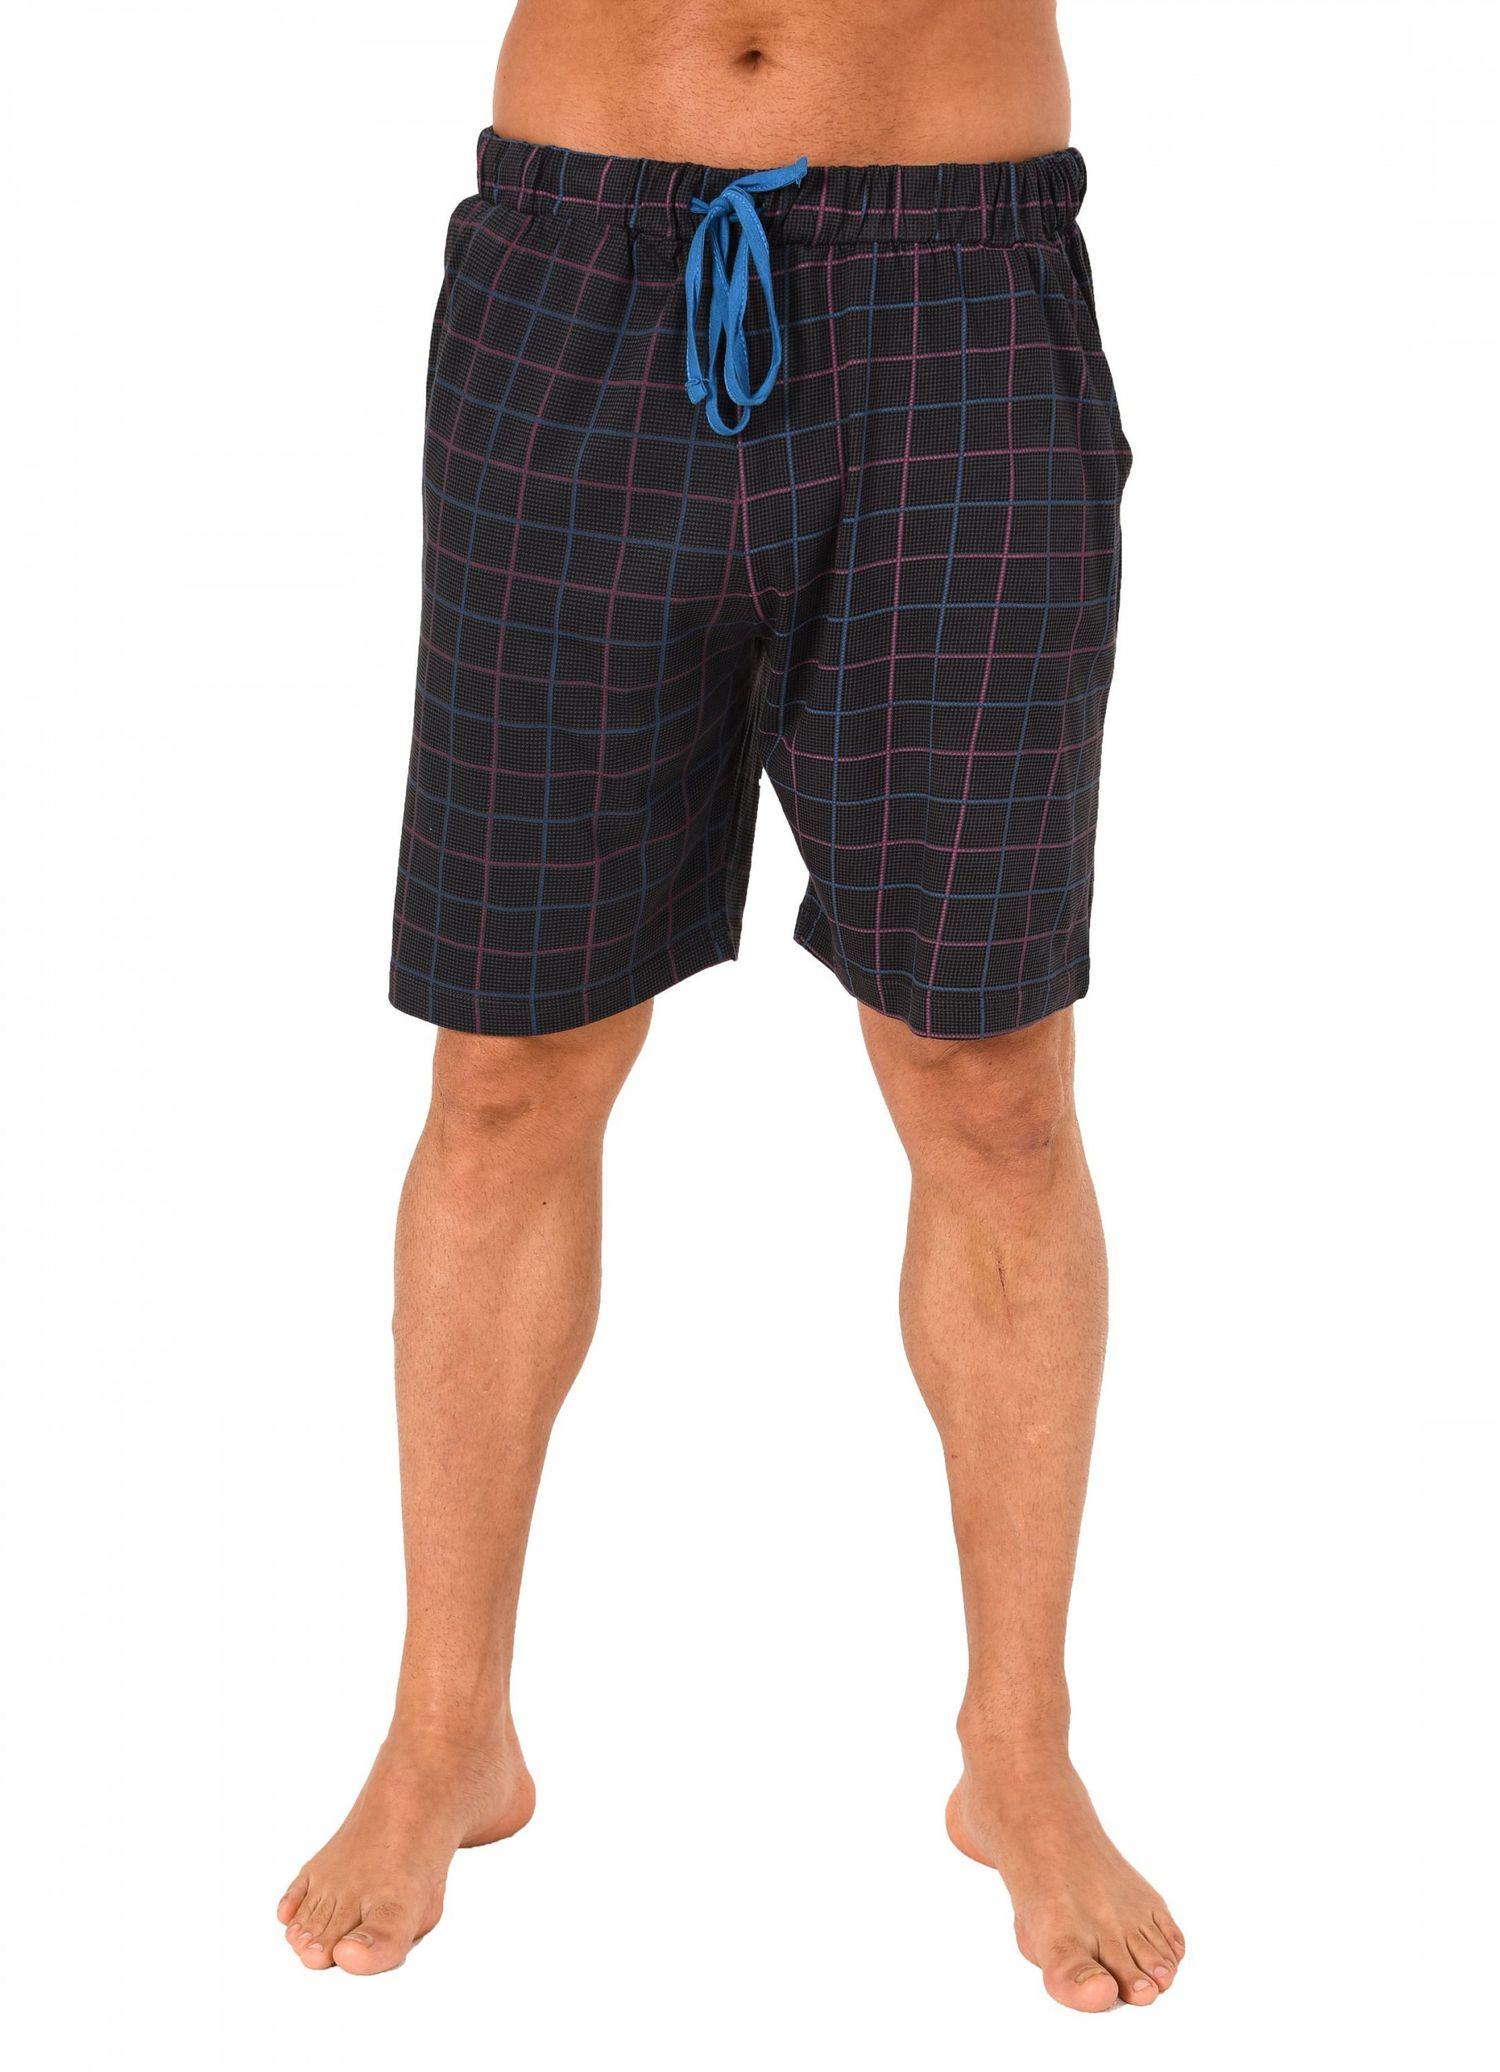 Herren Pyjama Hose kurz – Mix & Match – Karo Optik – 124 90 524 – Bild 2